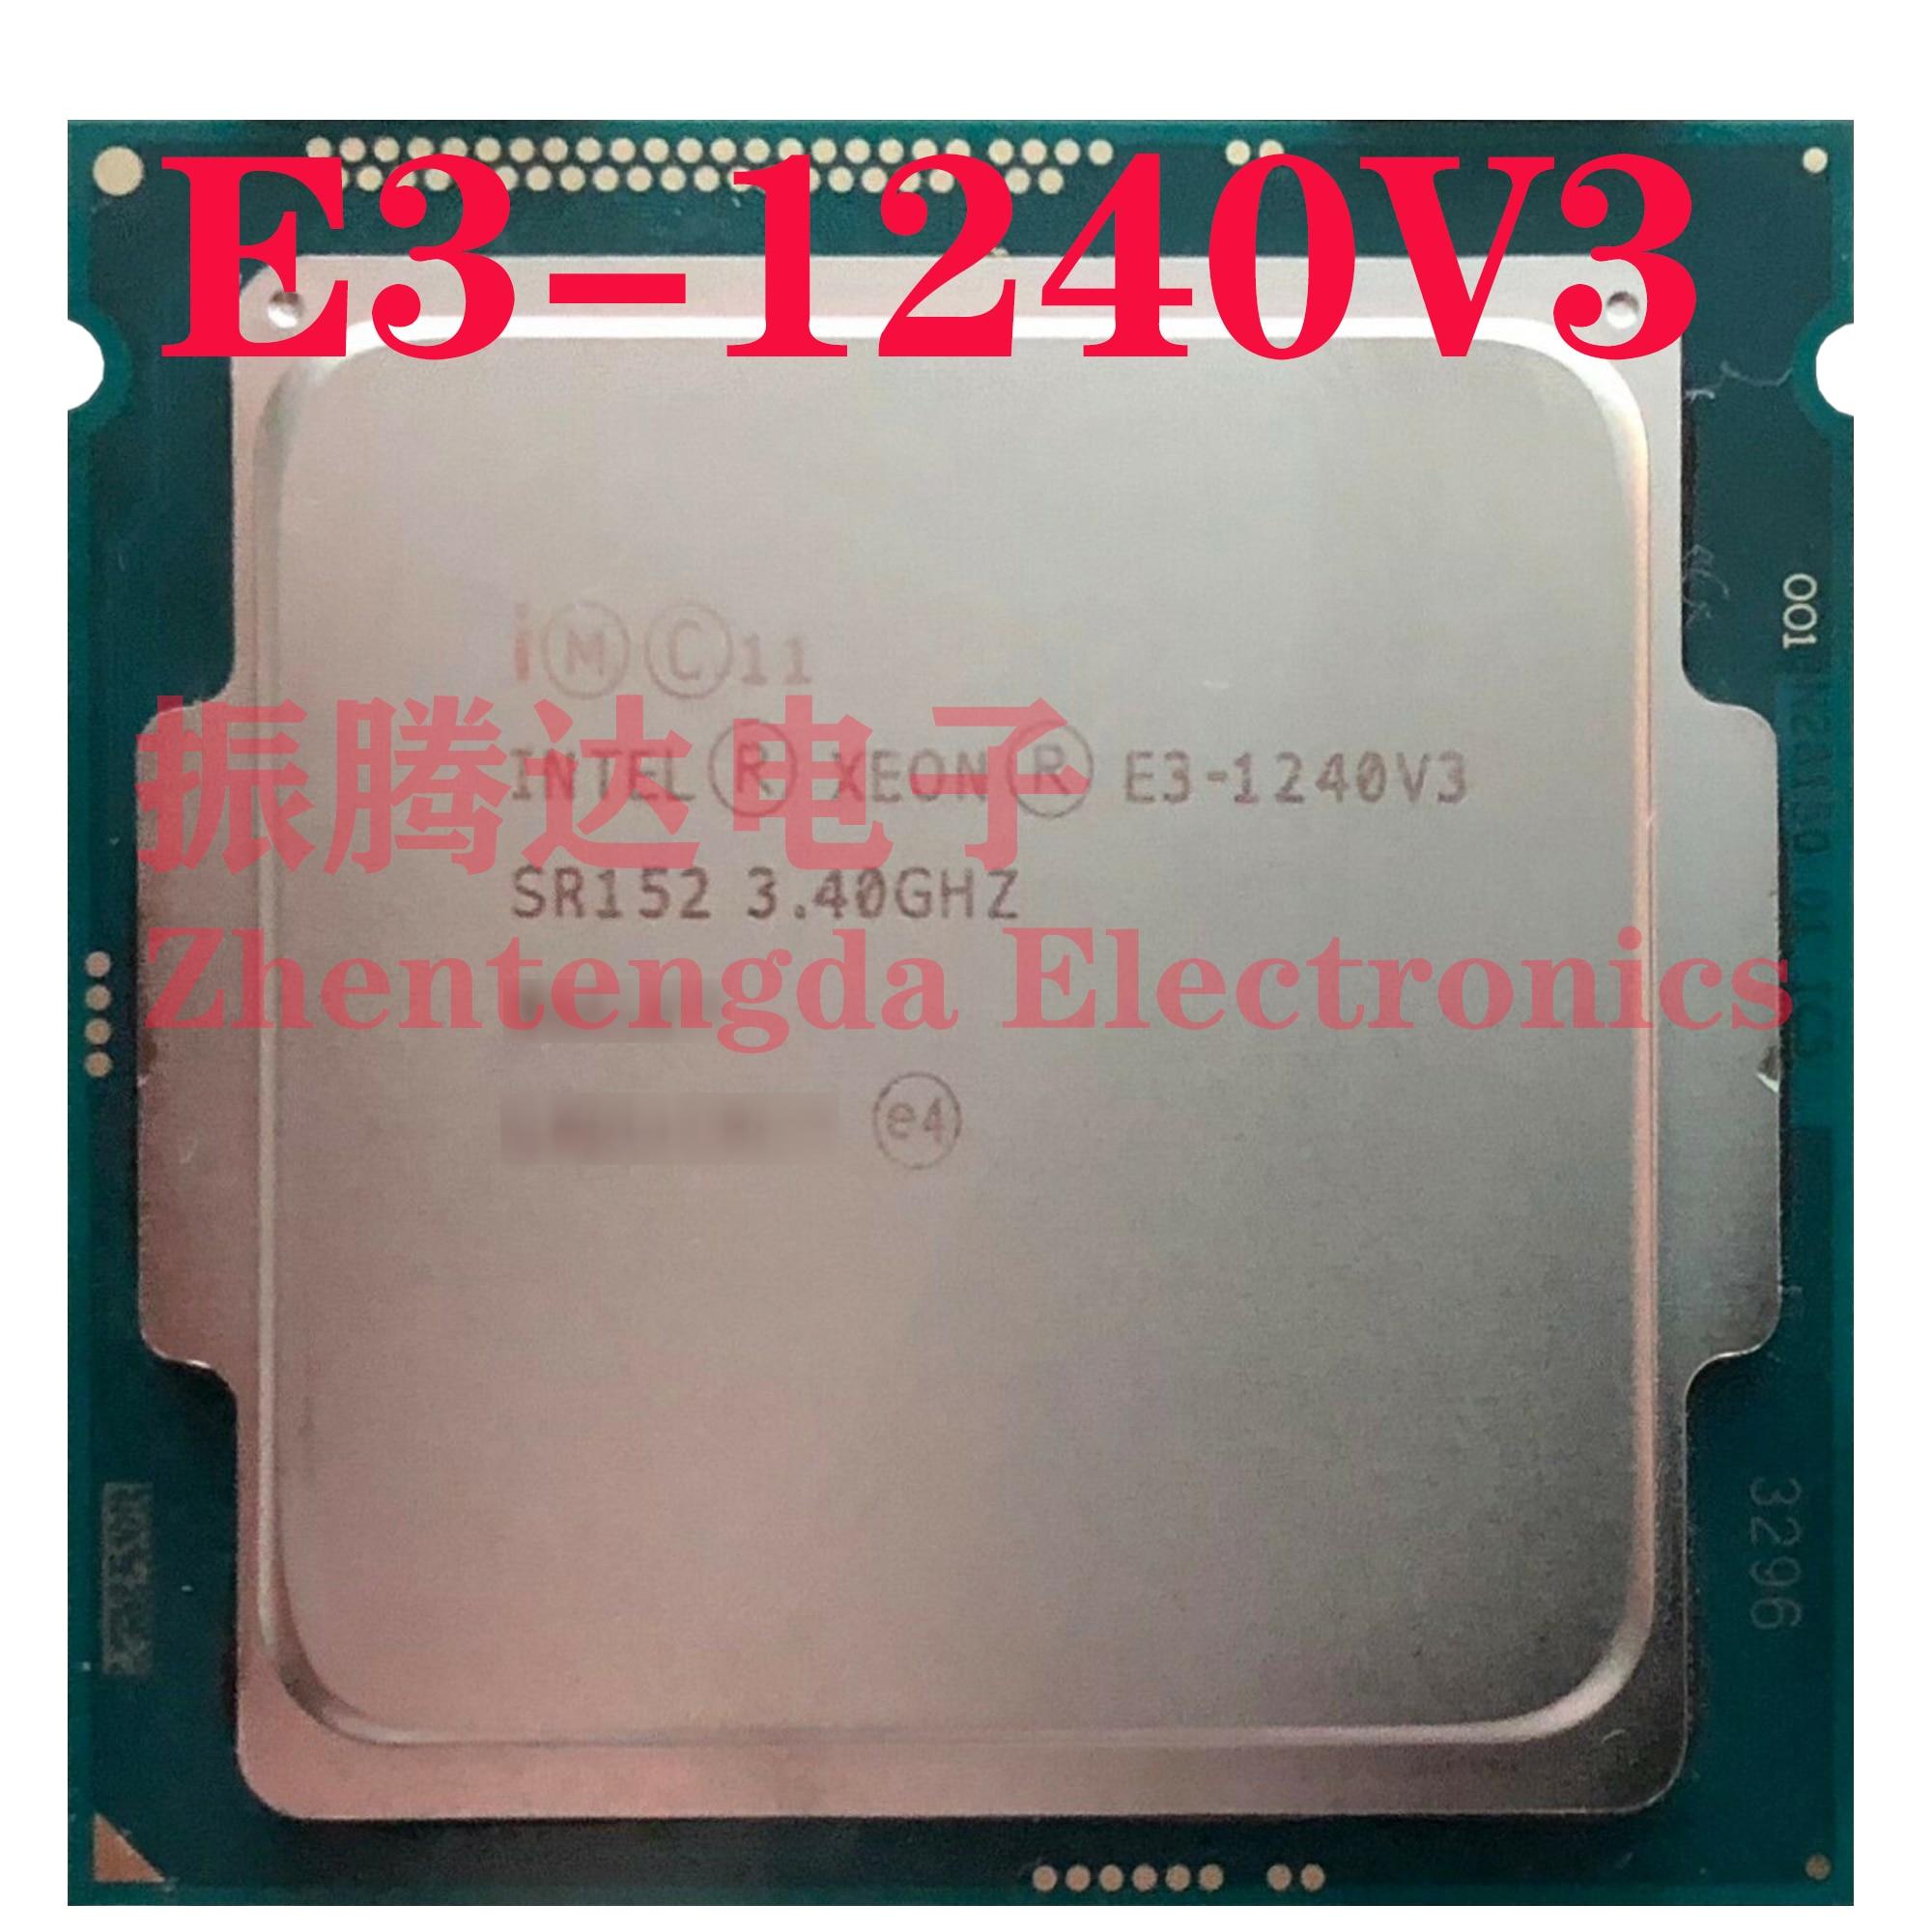 Intel Xeon E3-1240 v3 3.4GHz 8MB 4 Core 8 Thread LGA 1150 E3-1240v3 CPU Processor